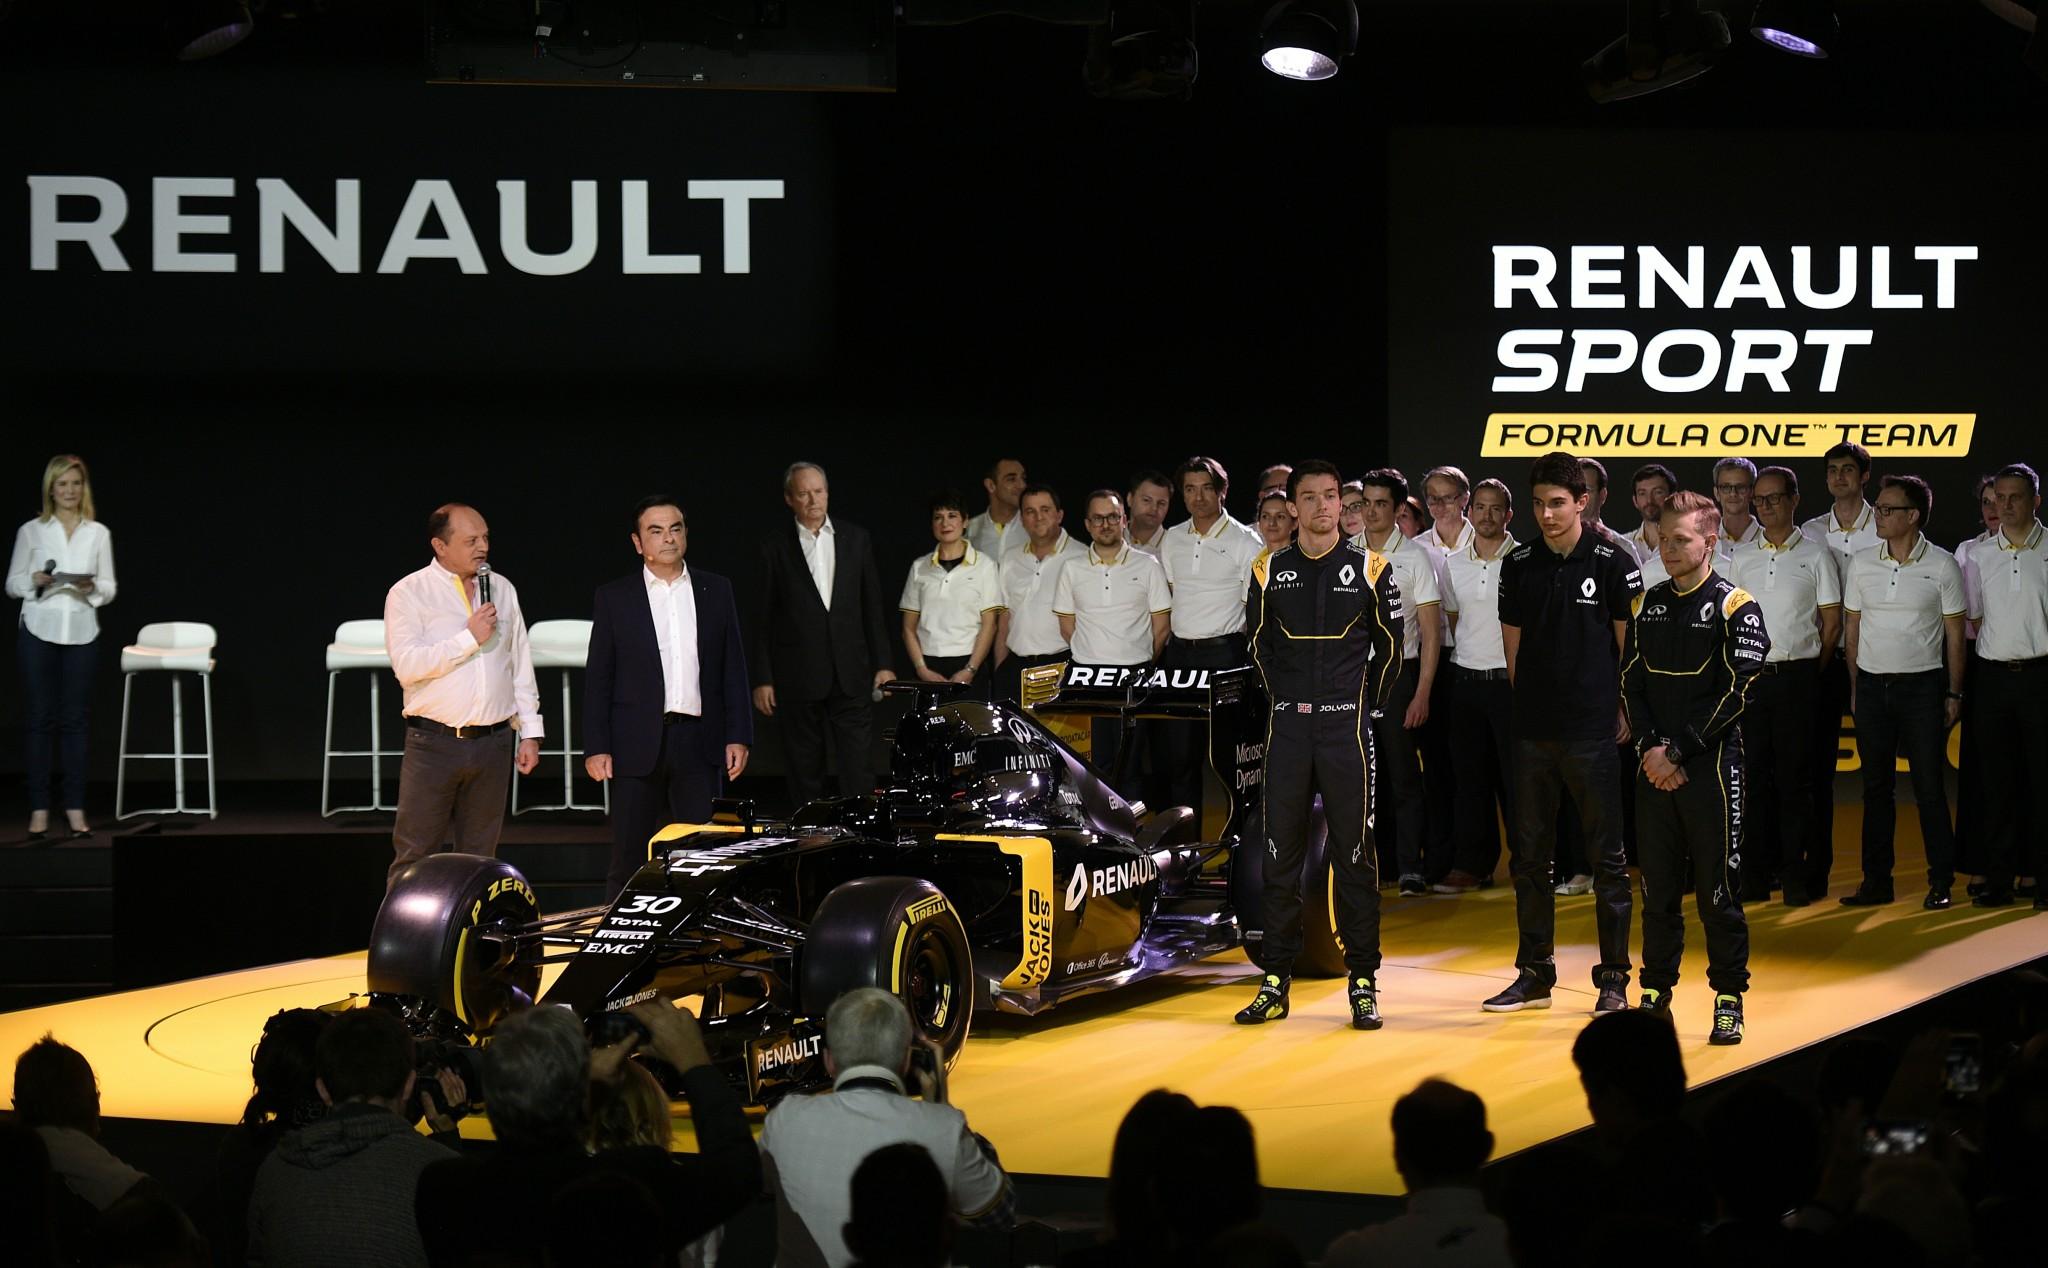 AUTO-F1-RENAULT